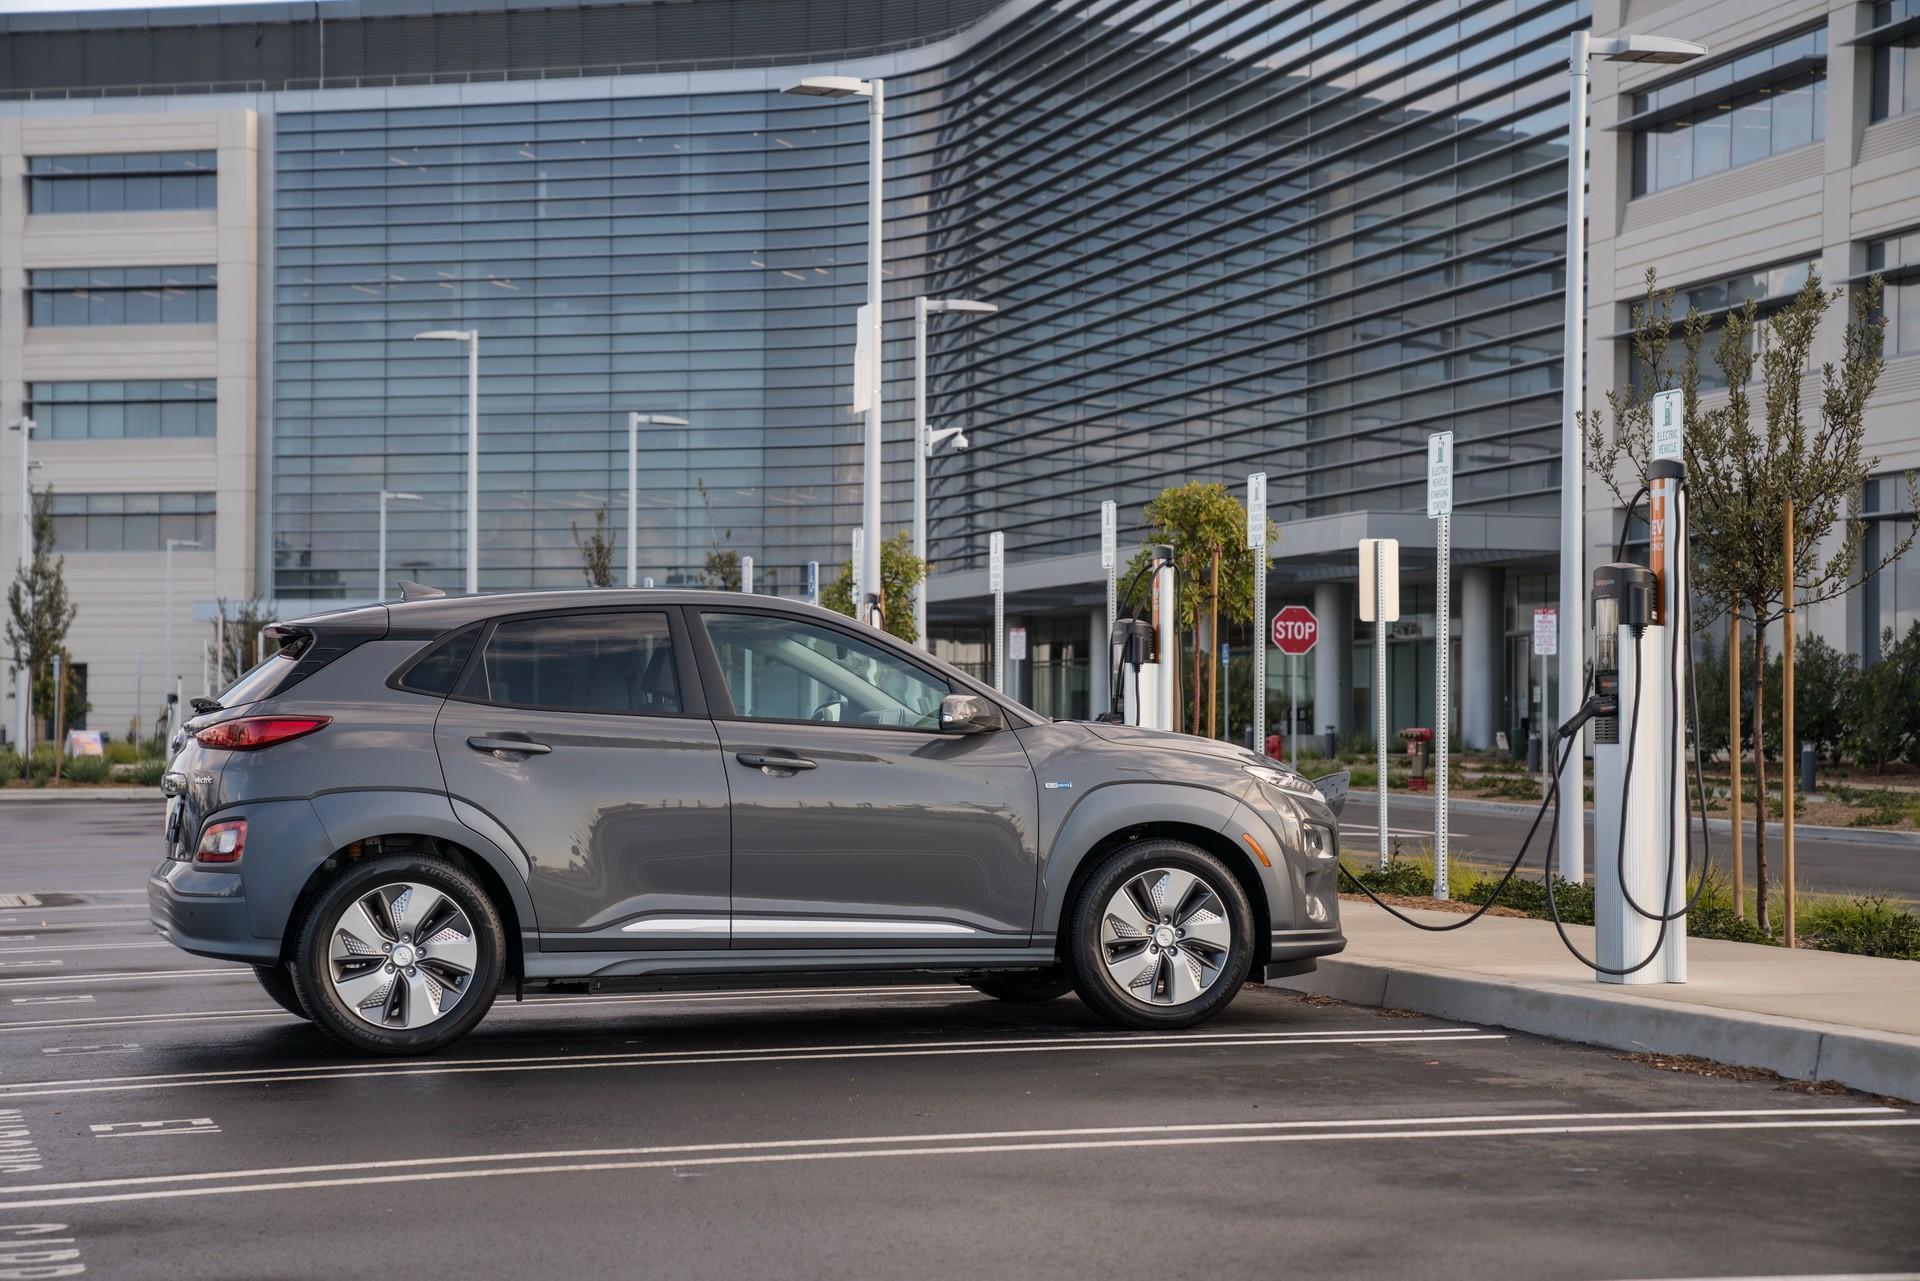 Hyundai Kona Electric Debuts In New York Promises 250 Mile Range